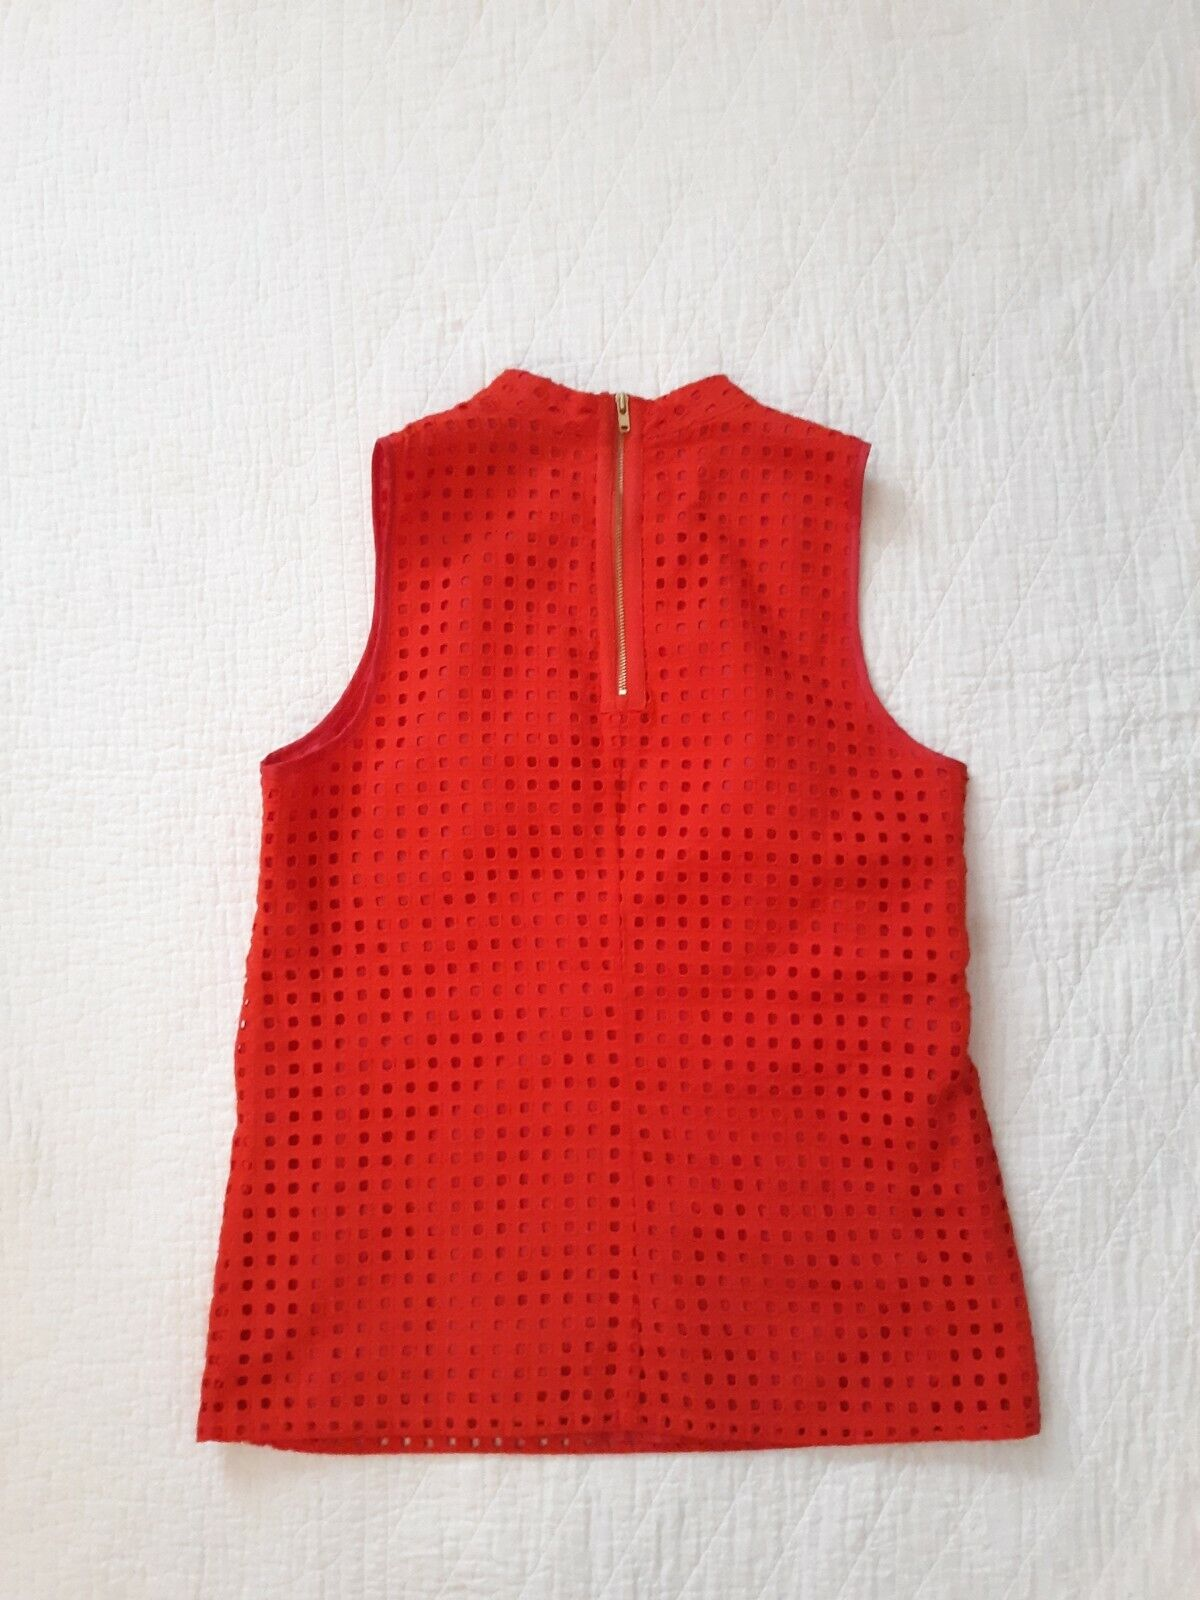 J. Crew Red Cotton Eyelet Sleeveless Top Size 2 - image 6